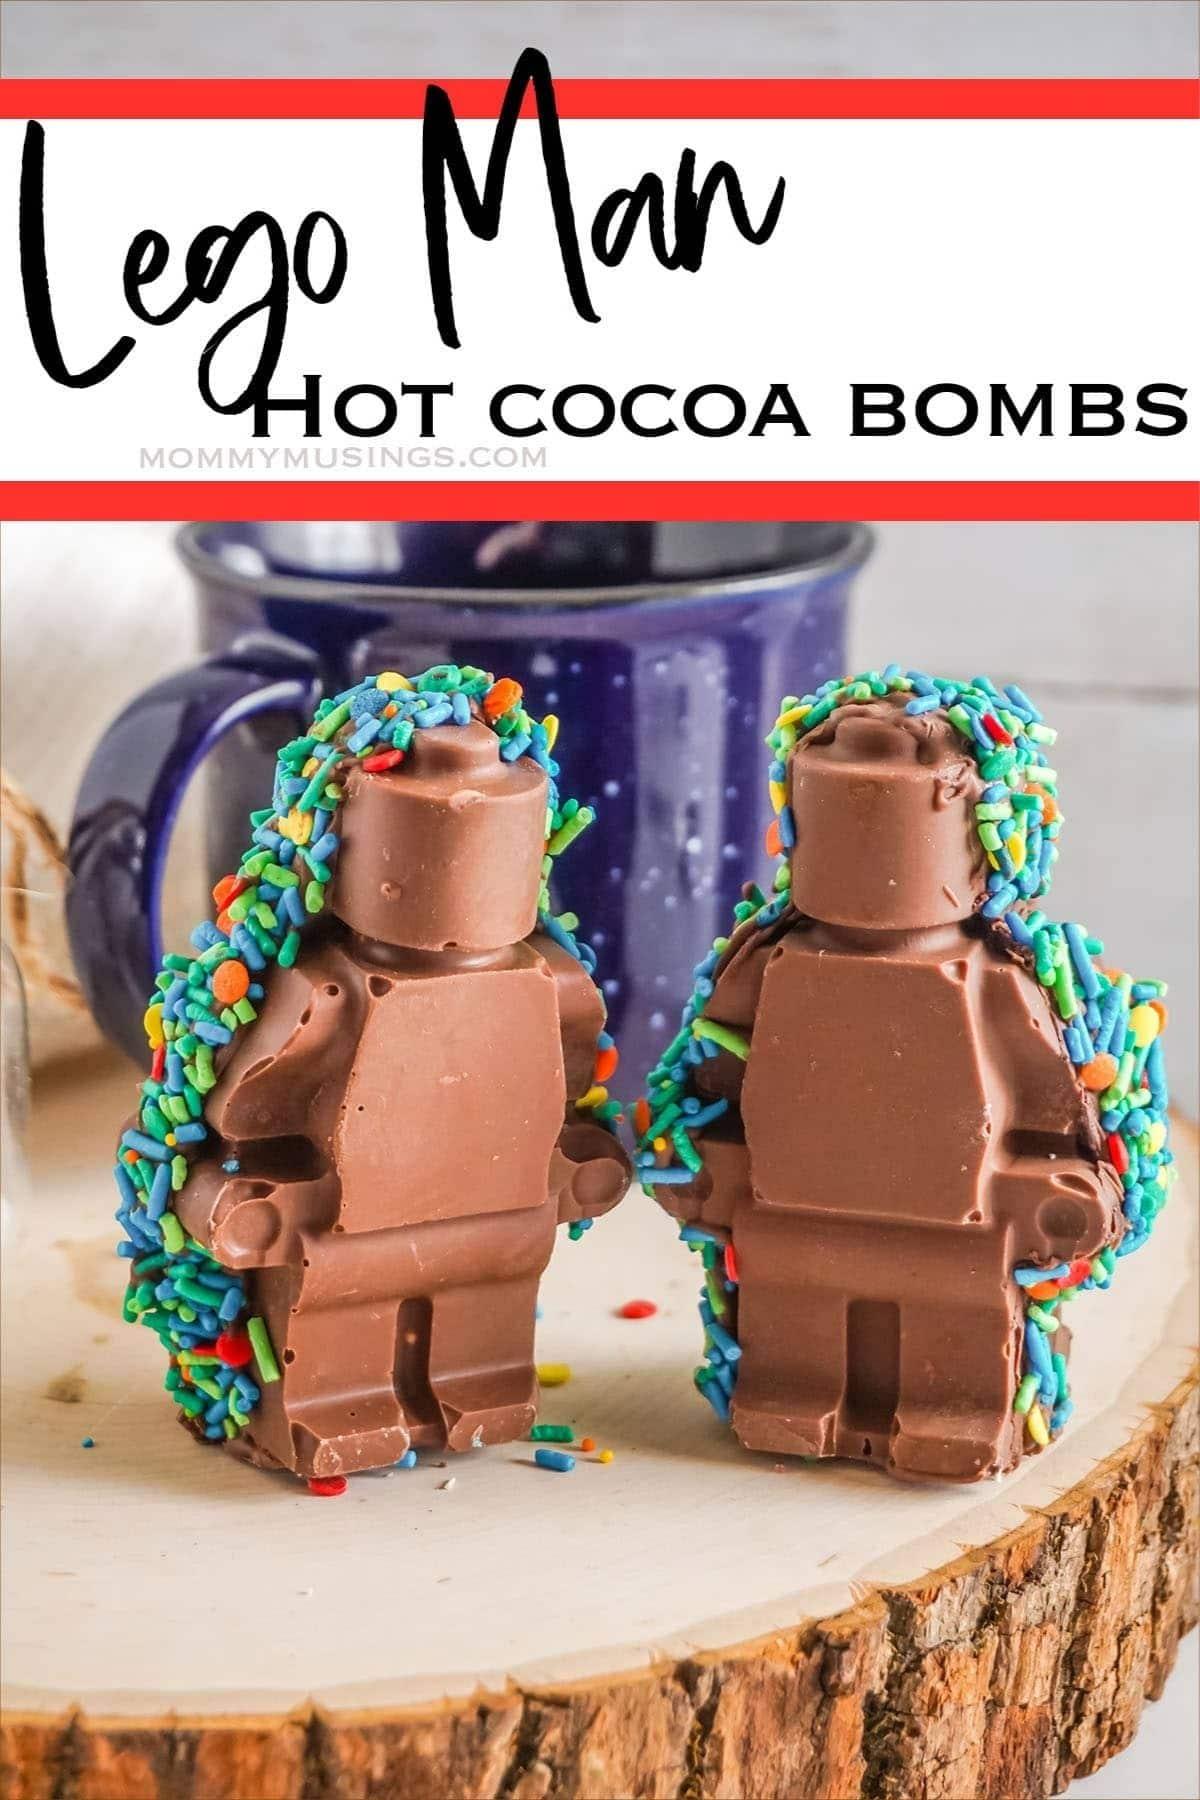 LEGO man hot cocoa bomb